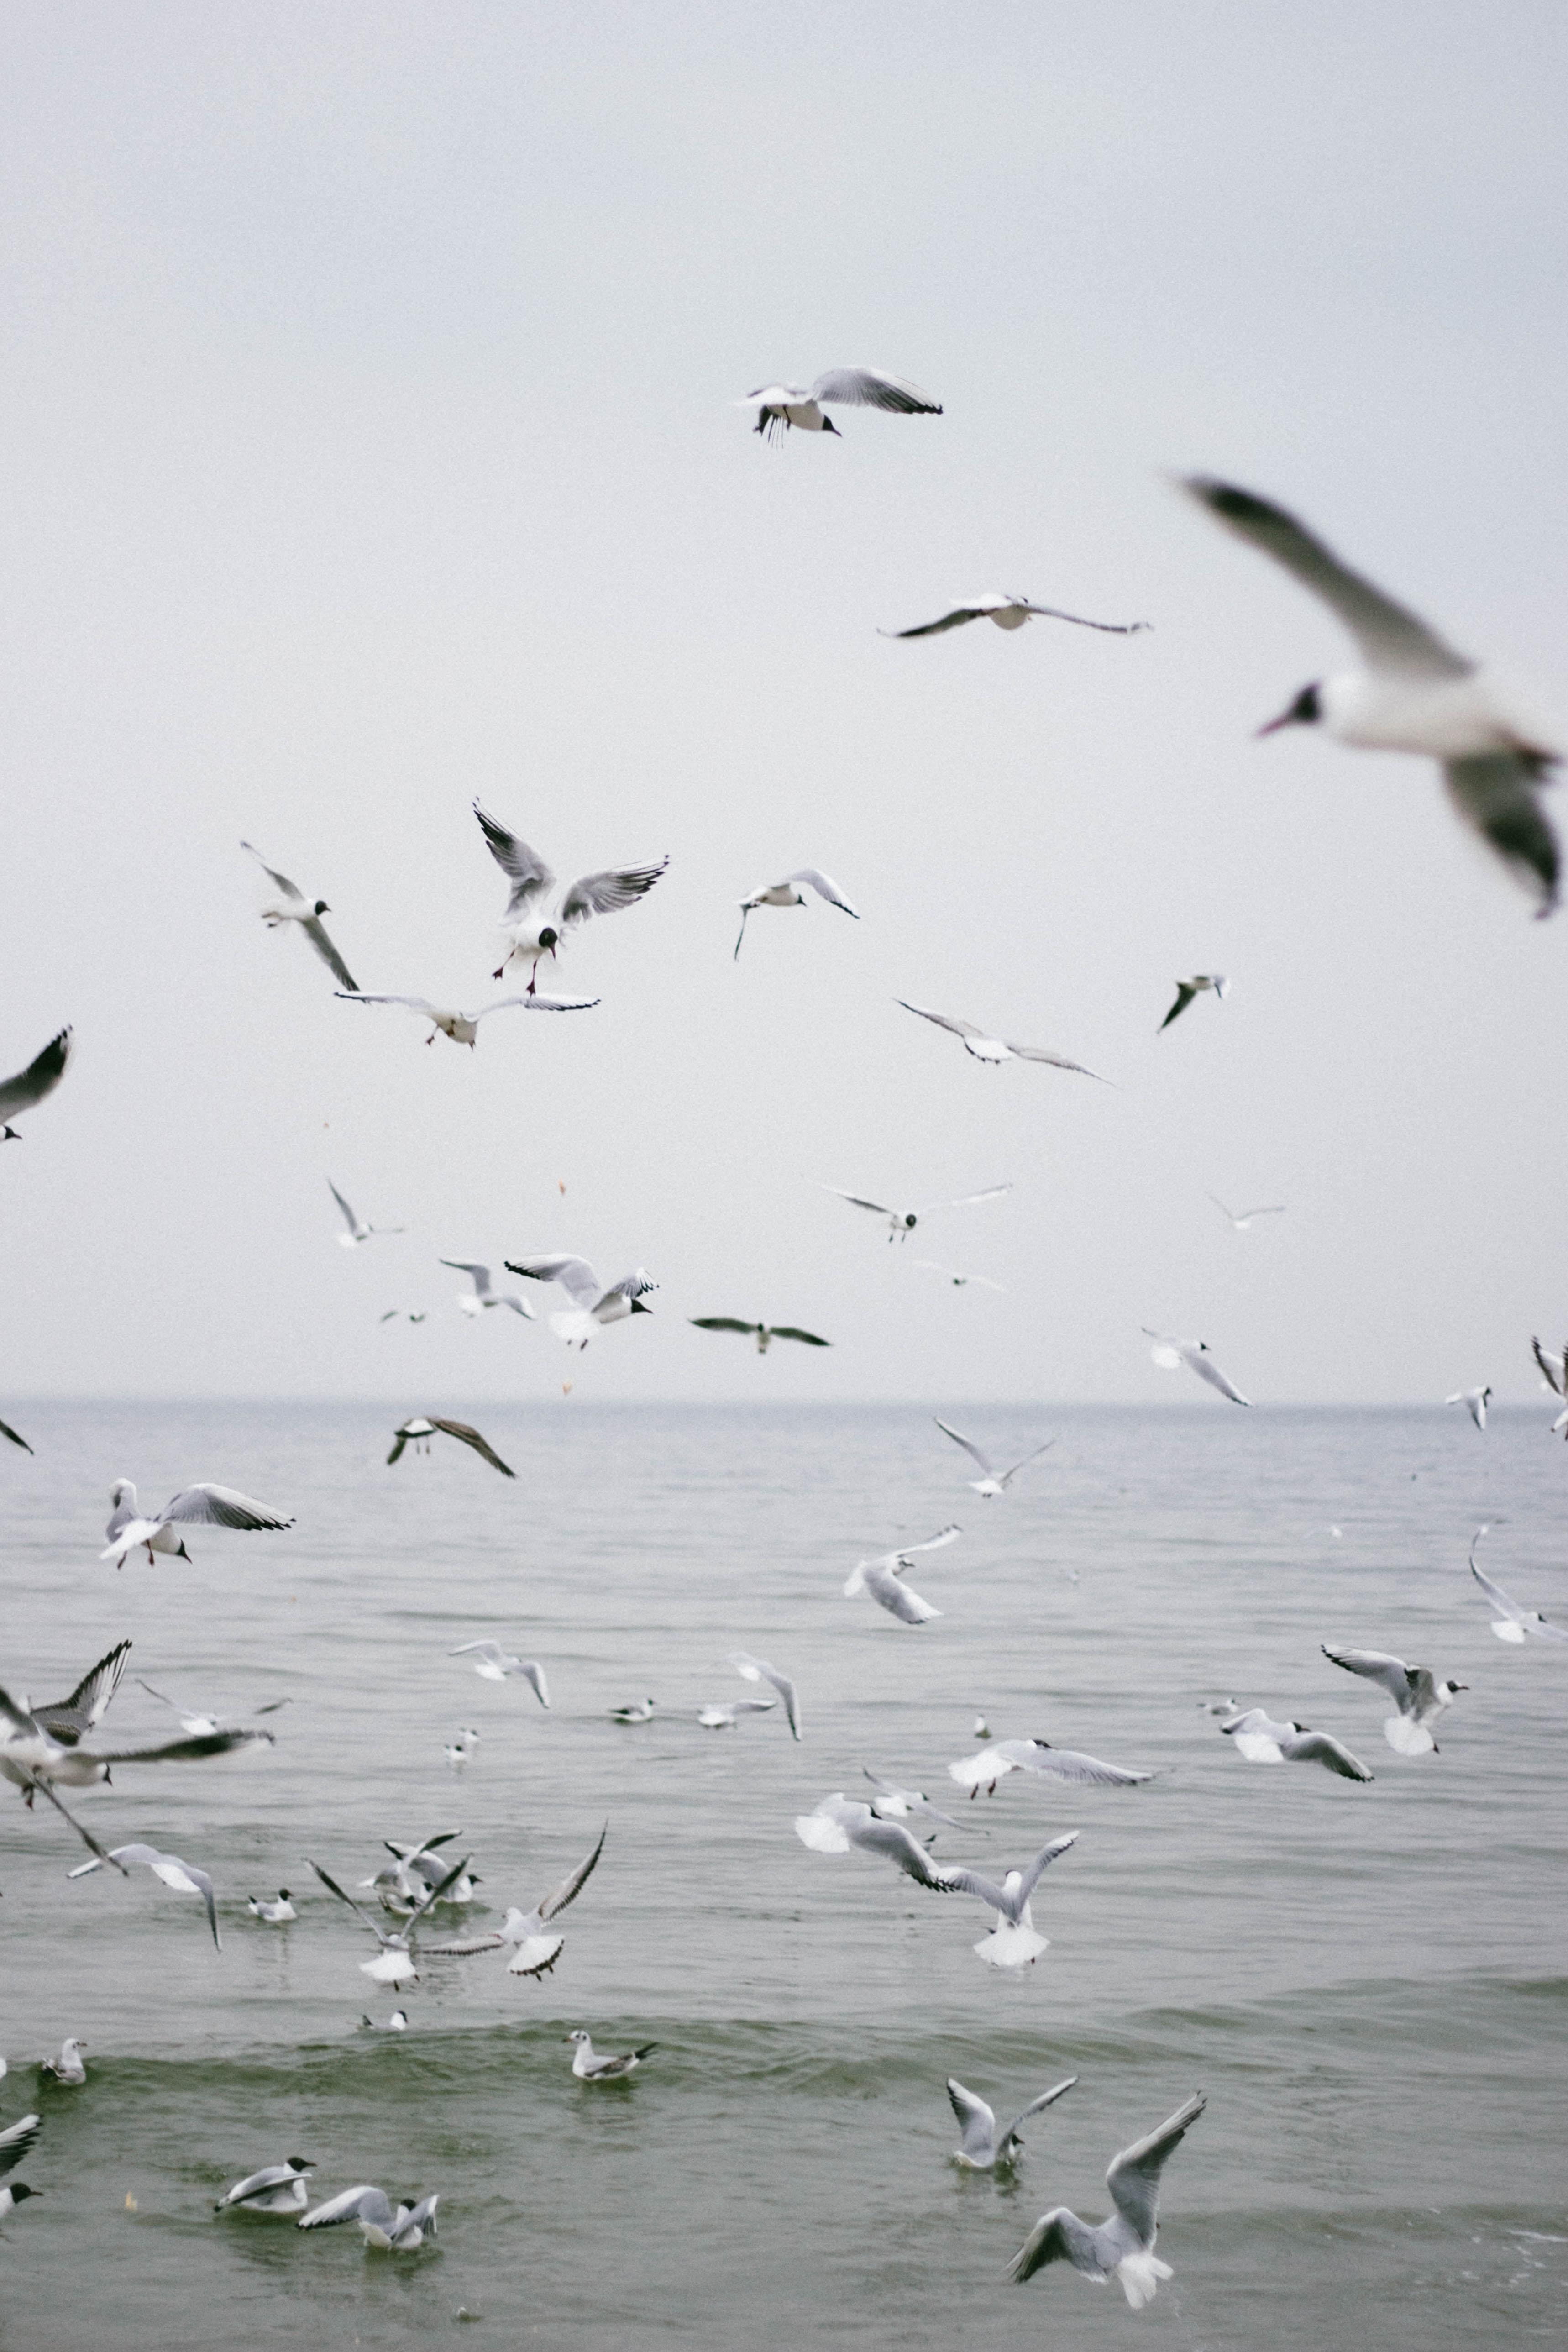 flock of birds flying on midair